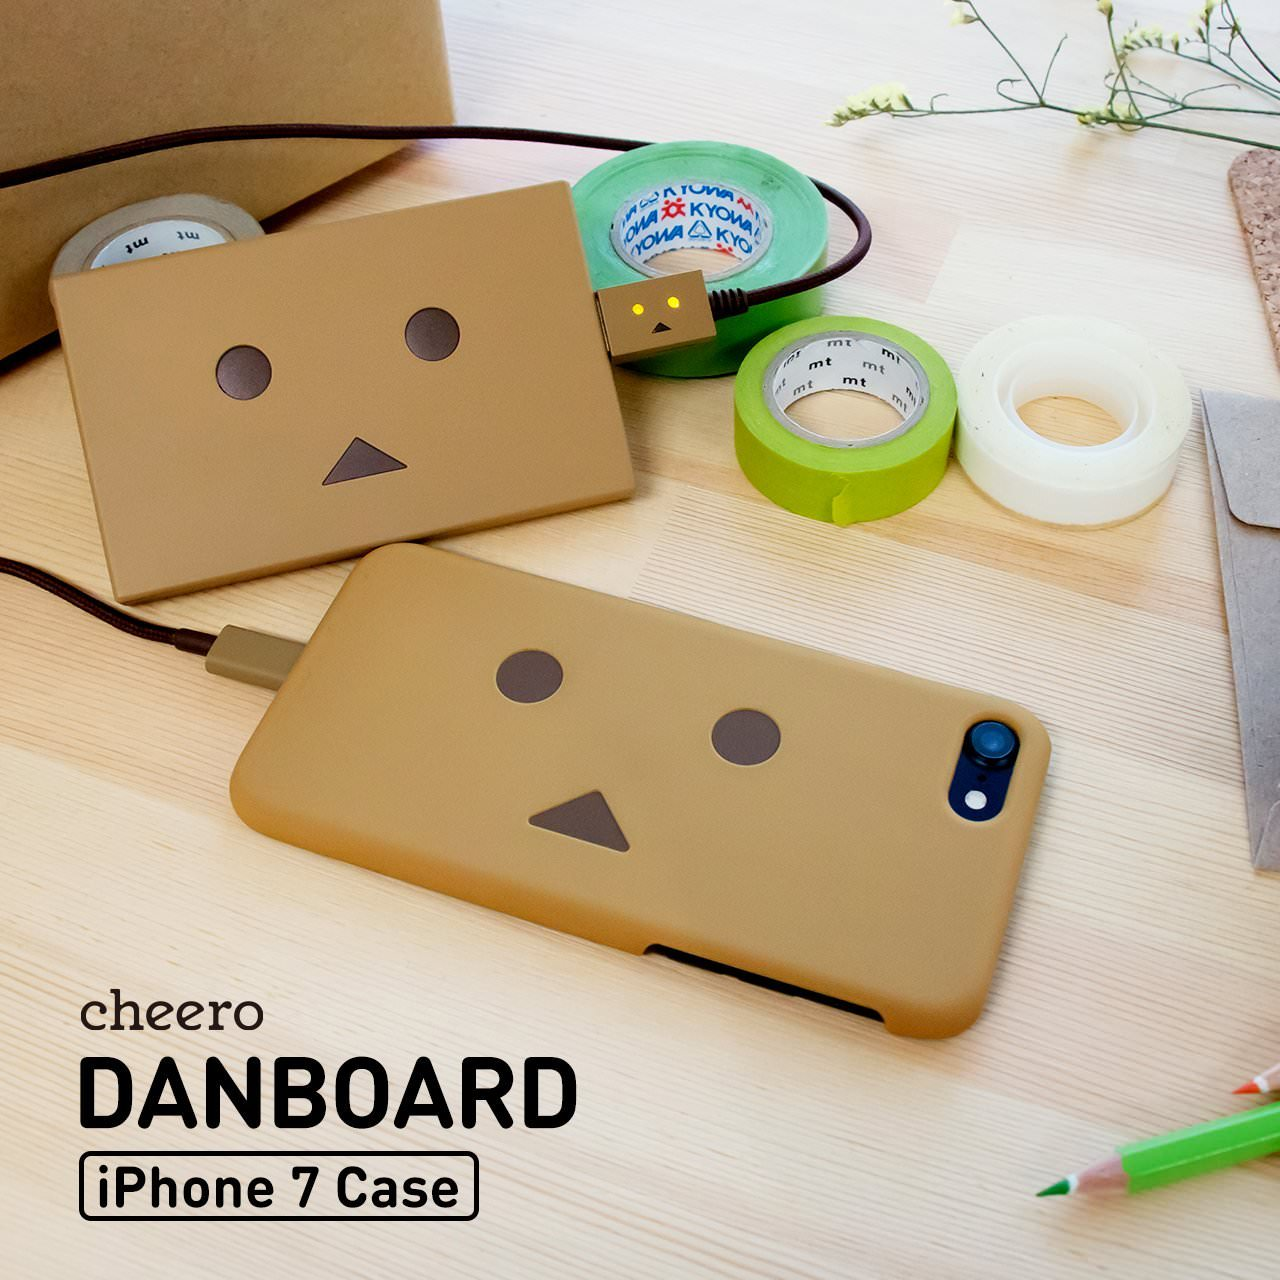 cheero-danboard-caseforiphone72